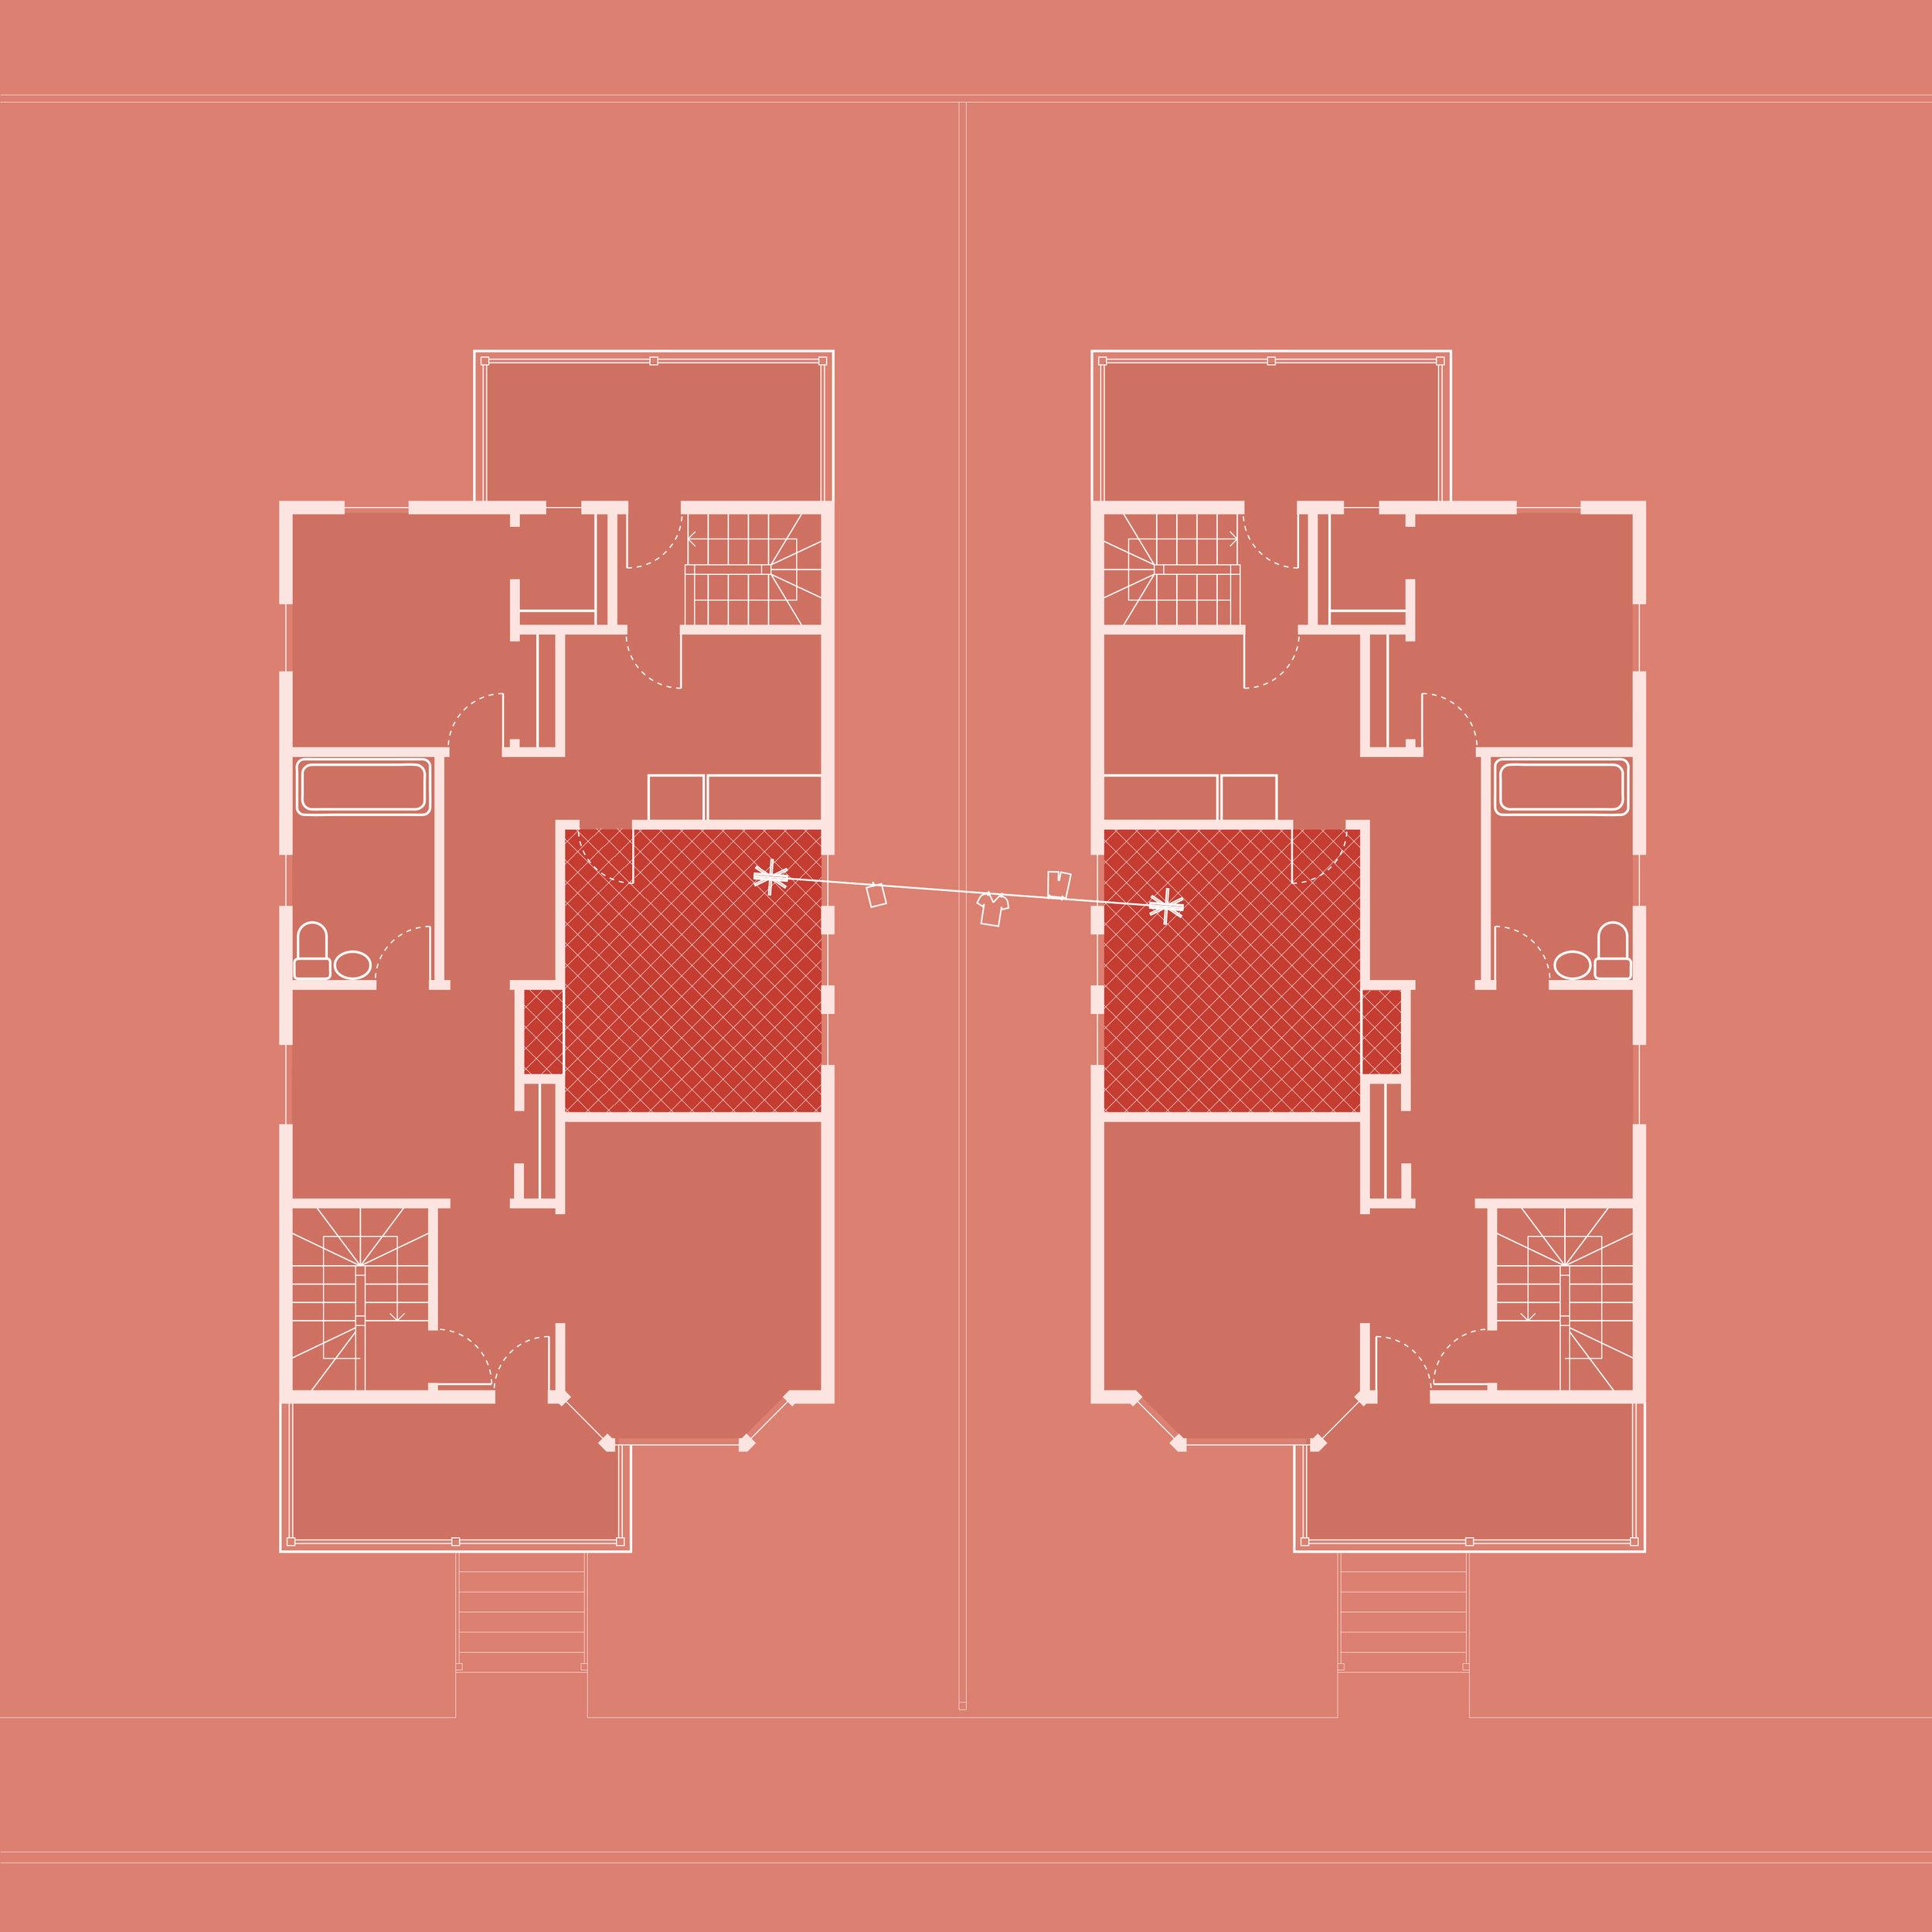 TripleDecker_Wormhole_Plans-5.jpg